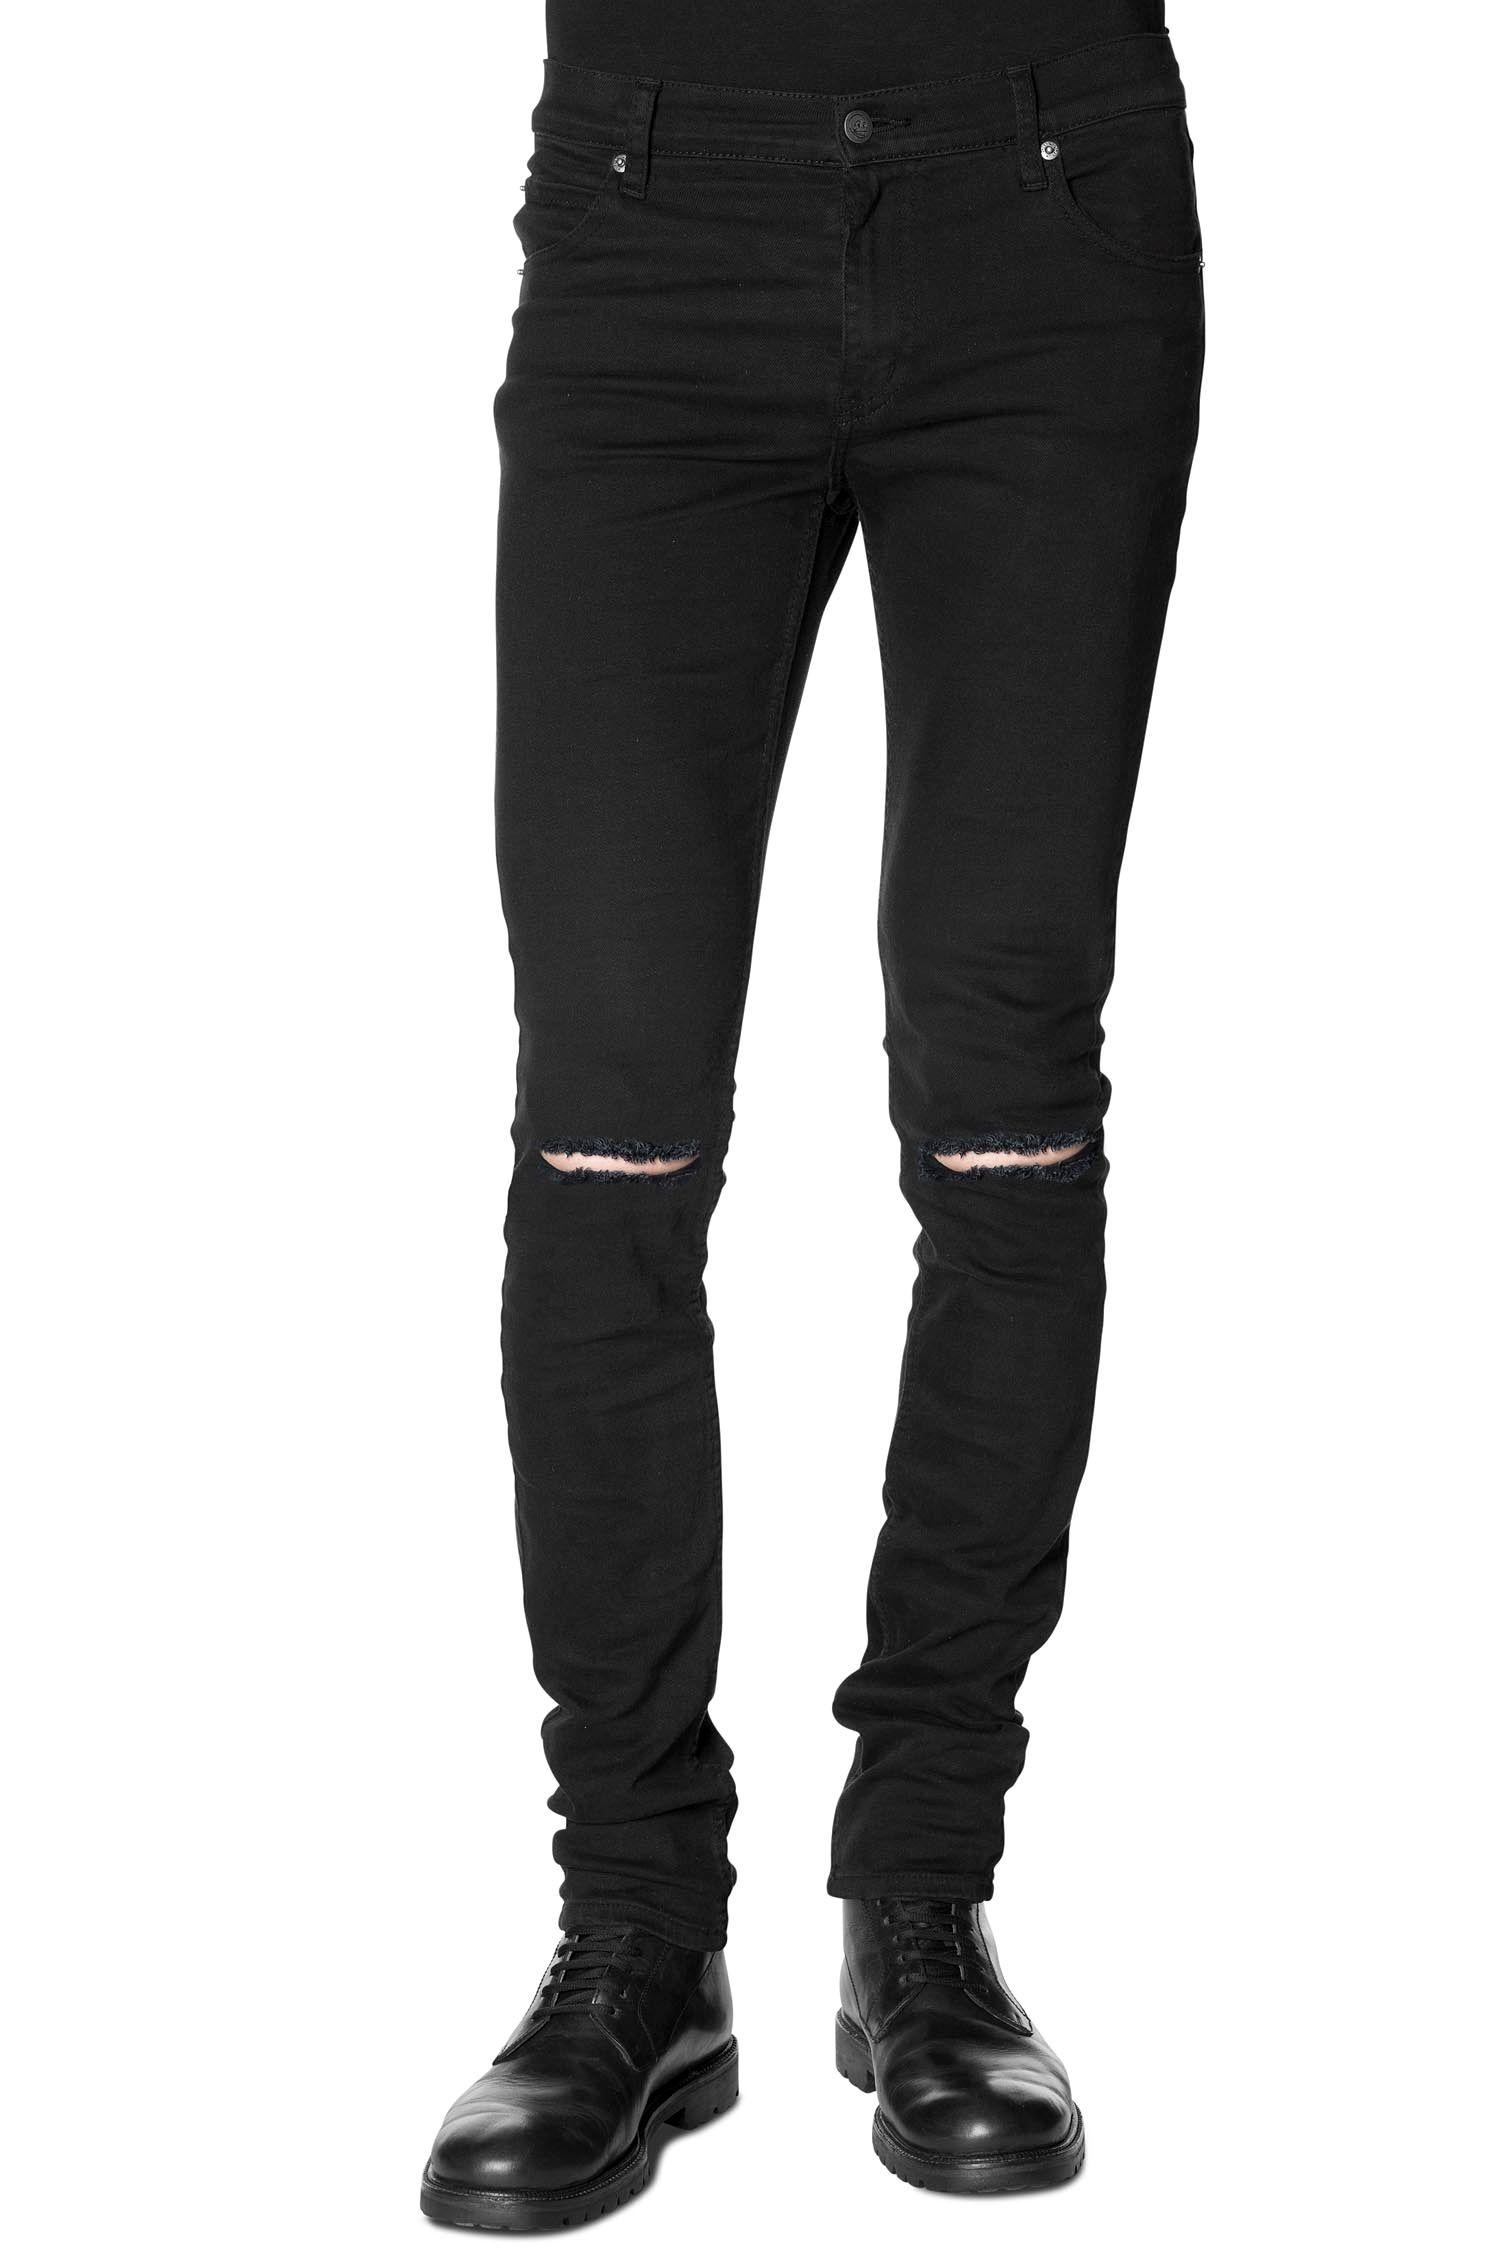 http://www.cheapmonday.com/shop-men/jeans/slim-fit/tight/tight-rip-black/4930785-7092148.1